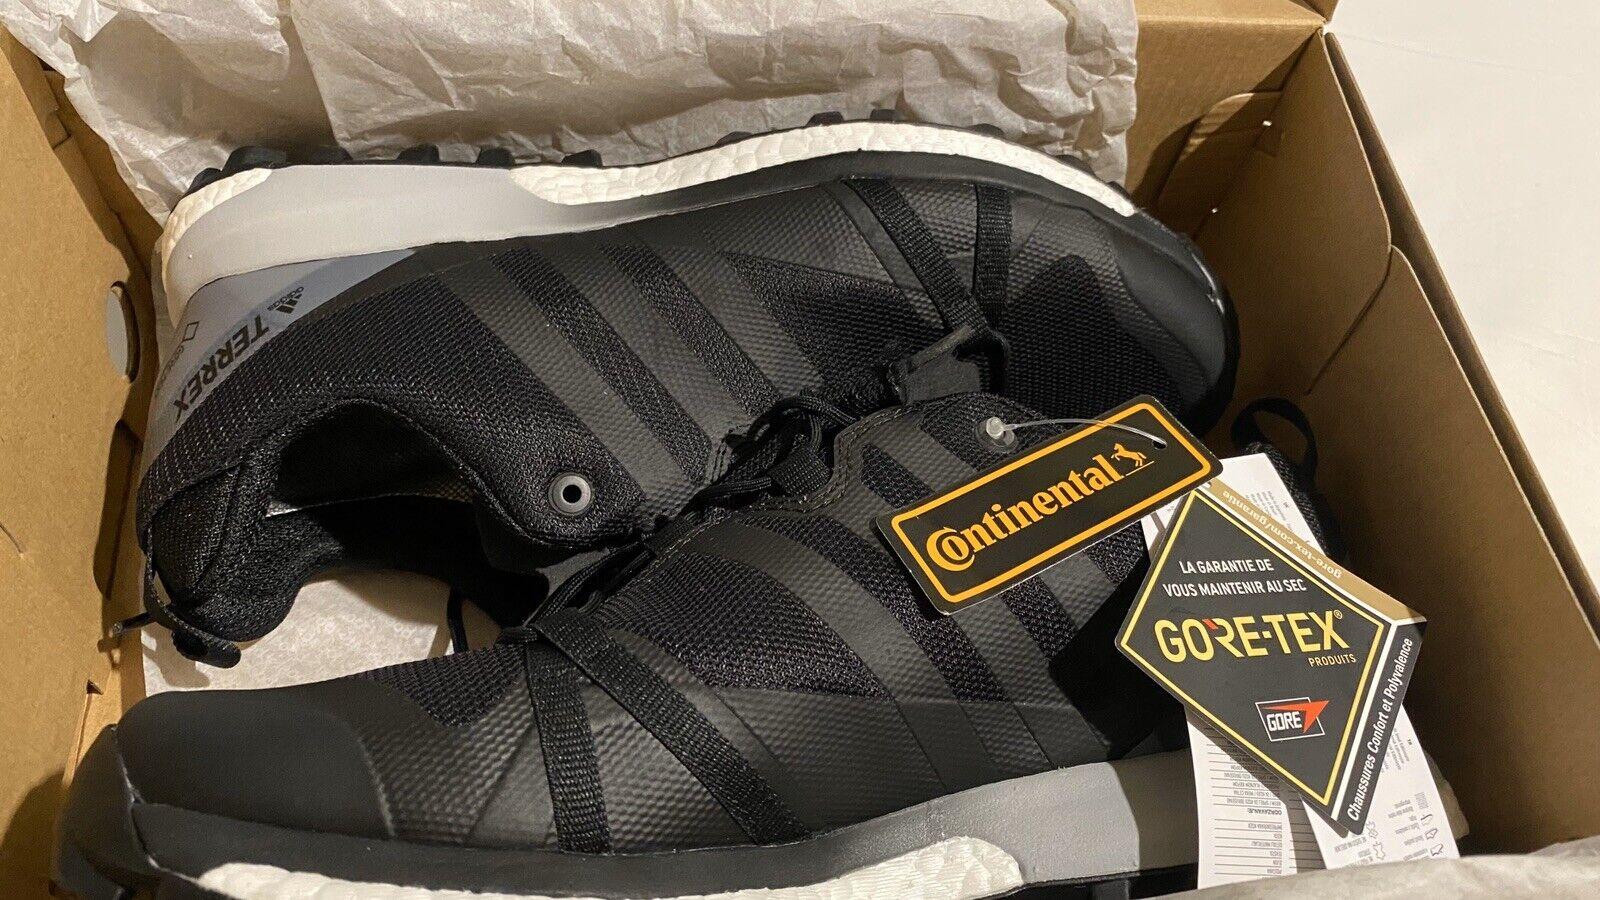 Adidas Ultra bBoost Terrex Agravic GTX